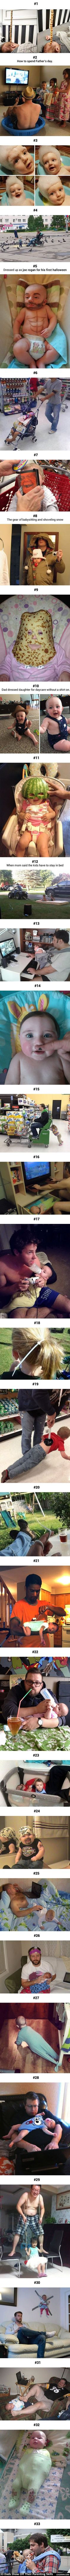 33 Dads Show Off Their Parenting Skills. http://ibeebz.com